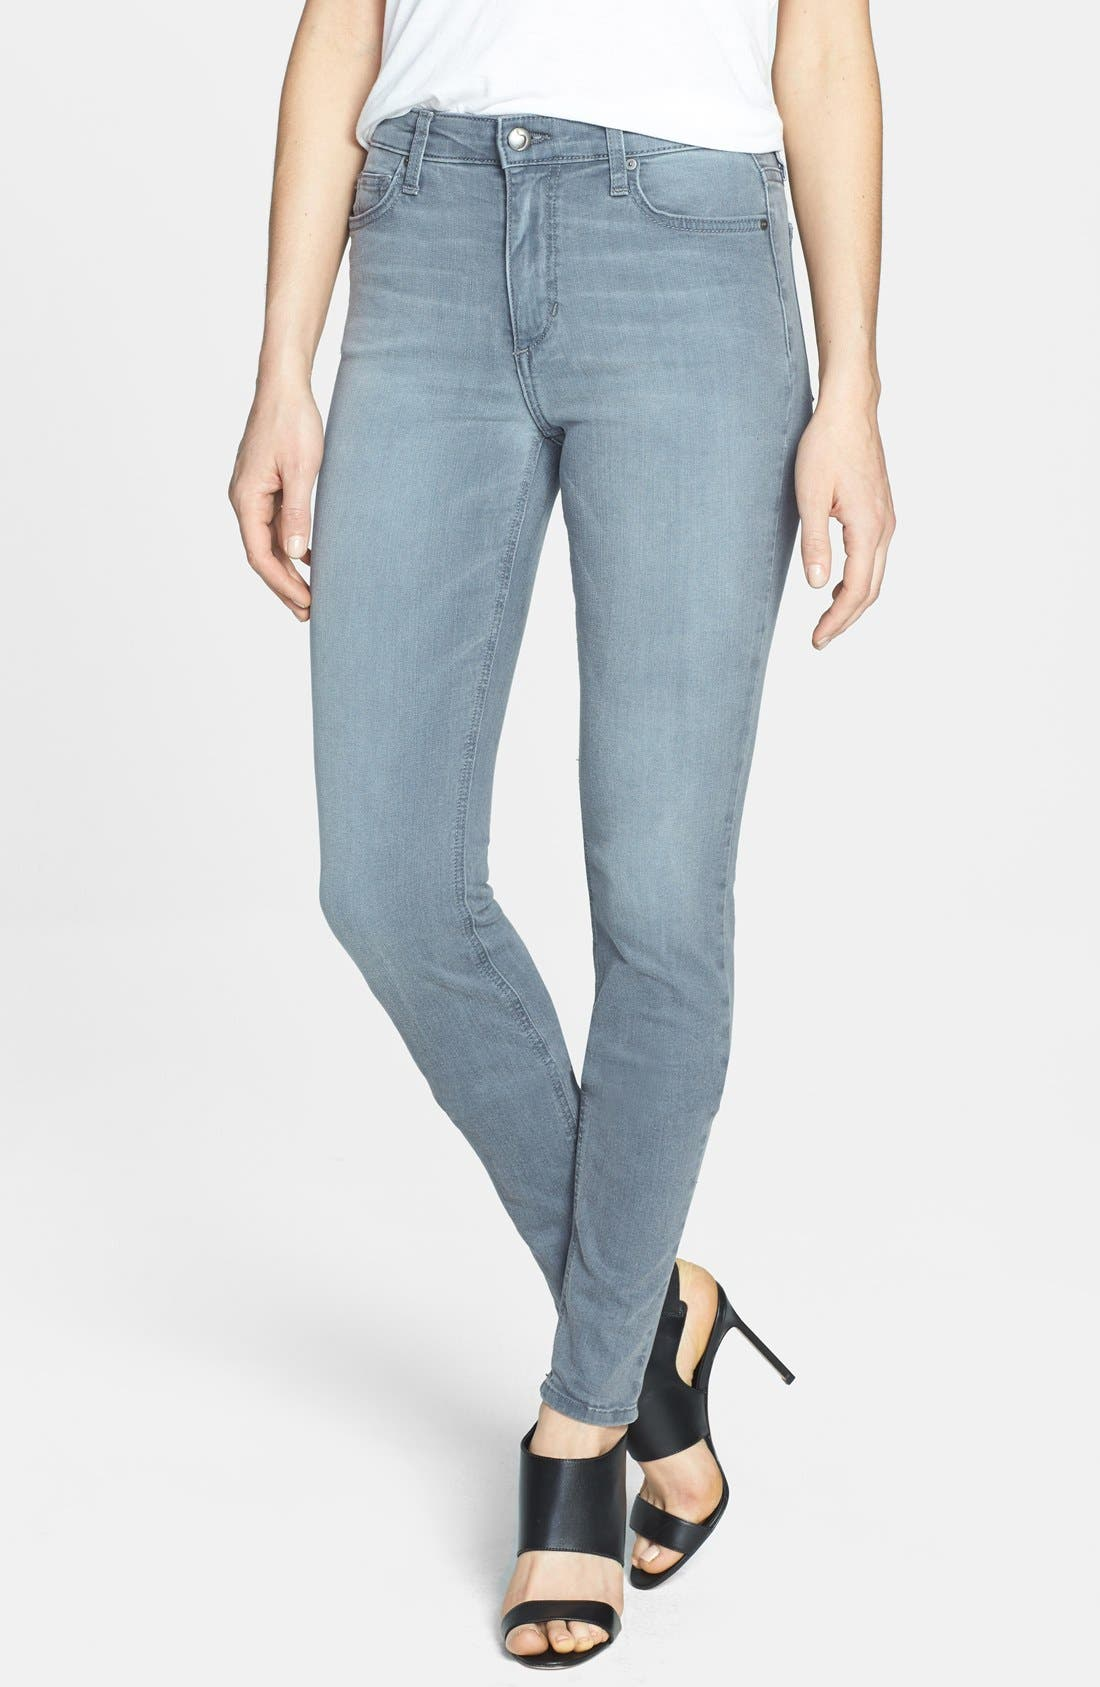 Main Image - Joe's 'Flawless' High Rise Skinny Jeans (Rakel)